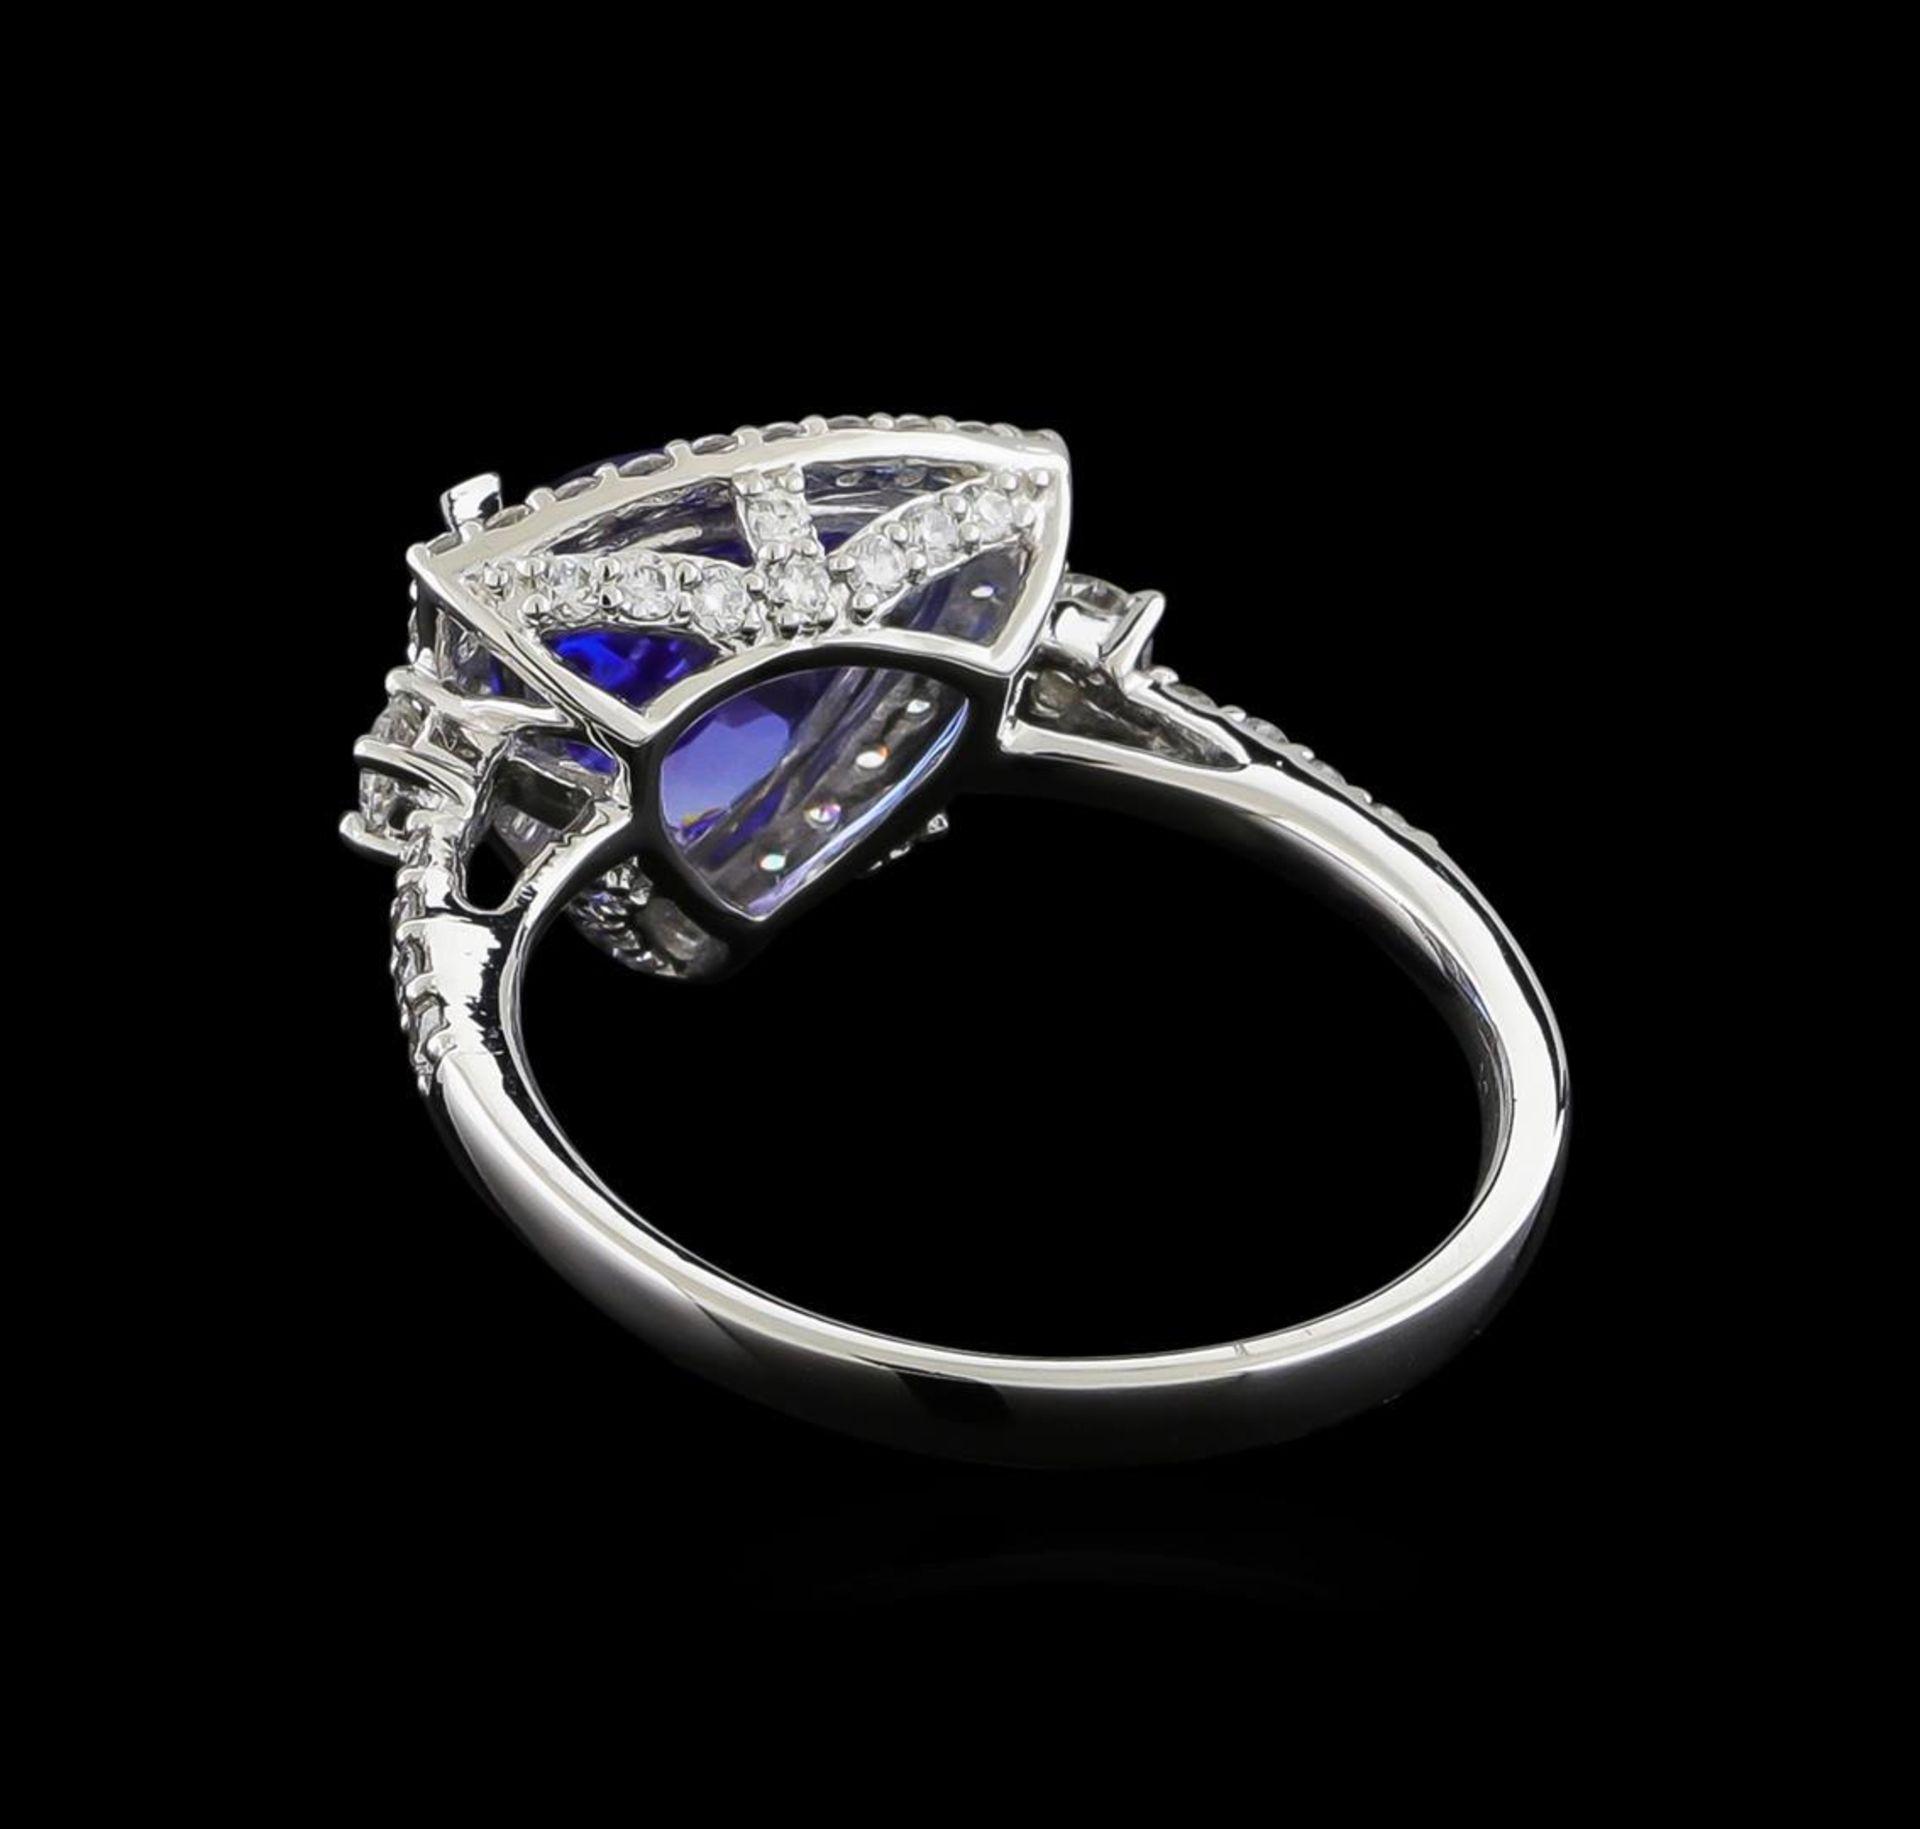 2.46 ctw Tanzanite and Diamond Ring - Platinum - Image 3 of 5